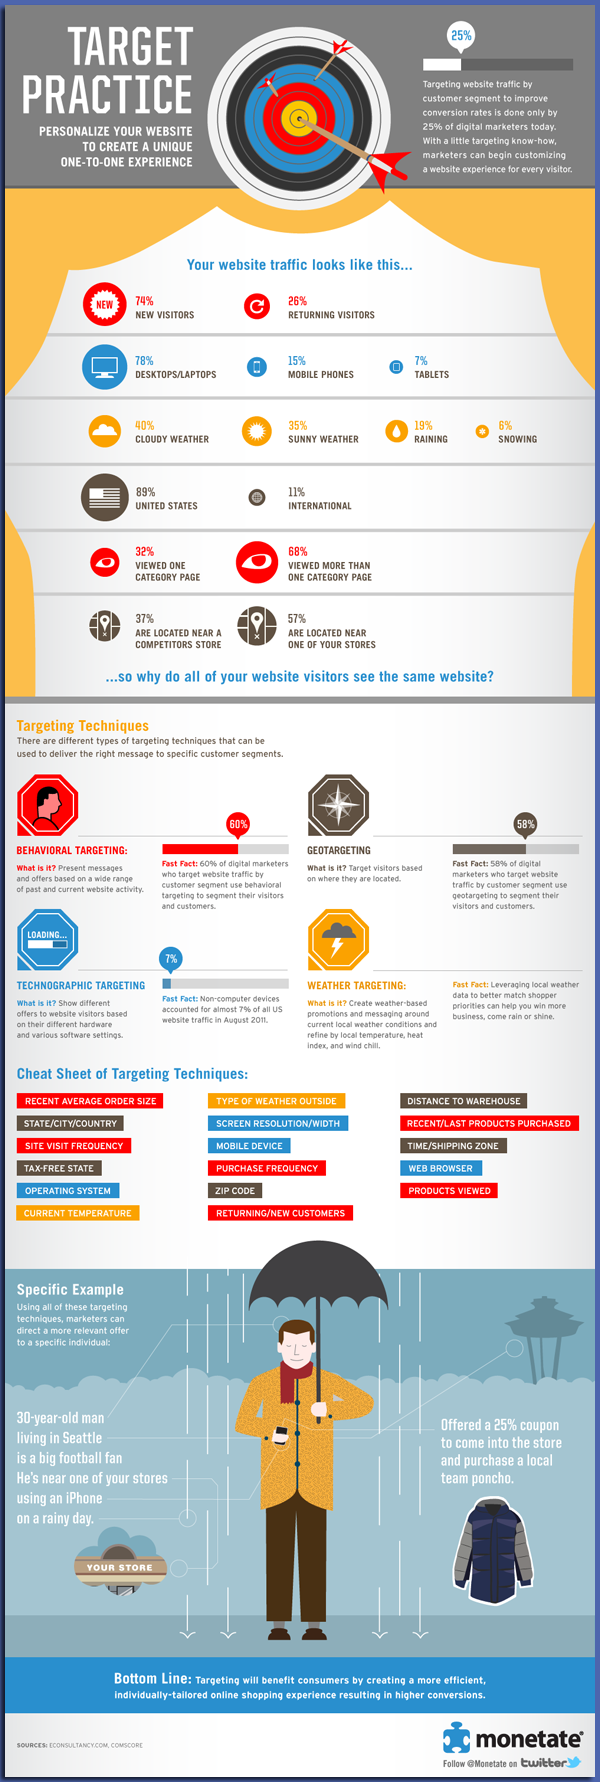 image for target marketing strategies